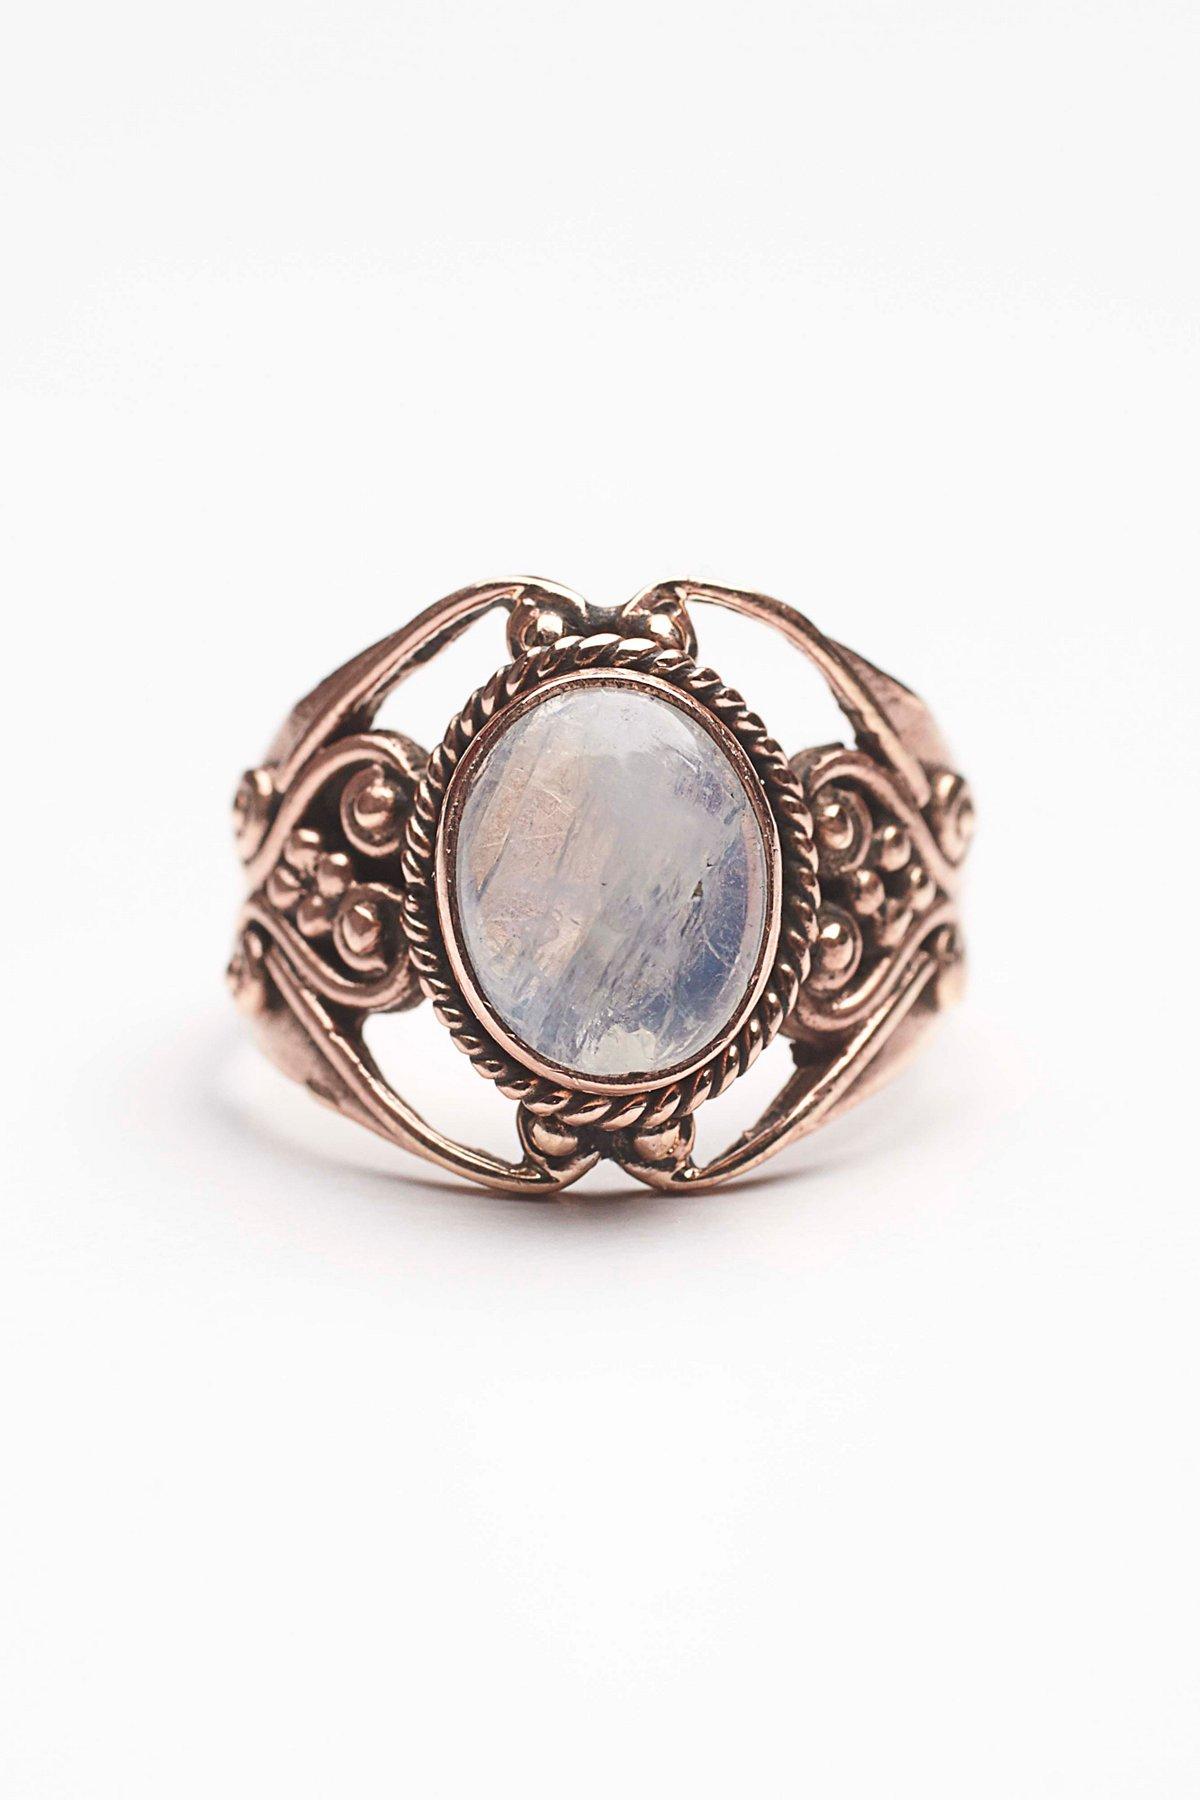 Moonstone Engraved Ring